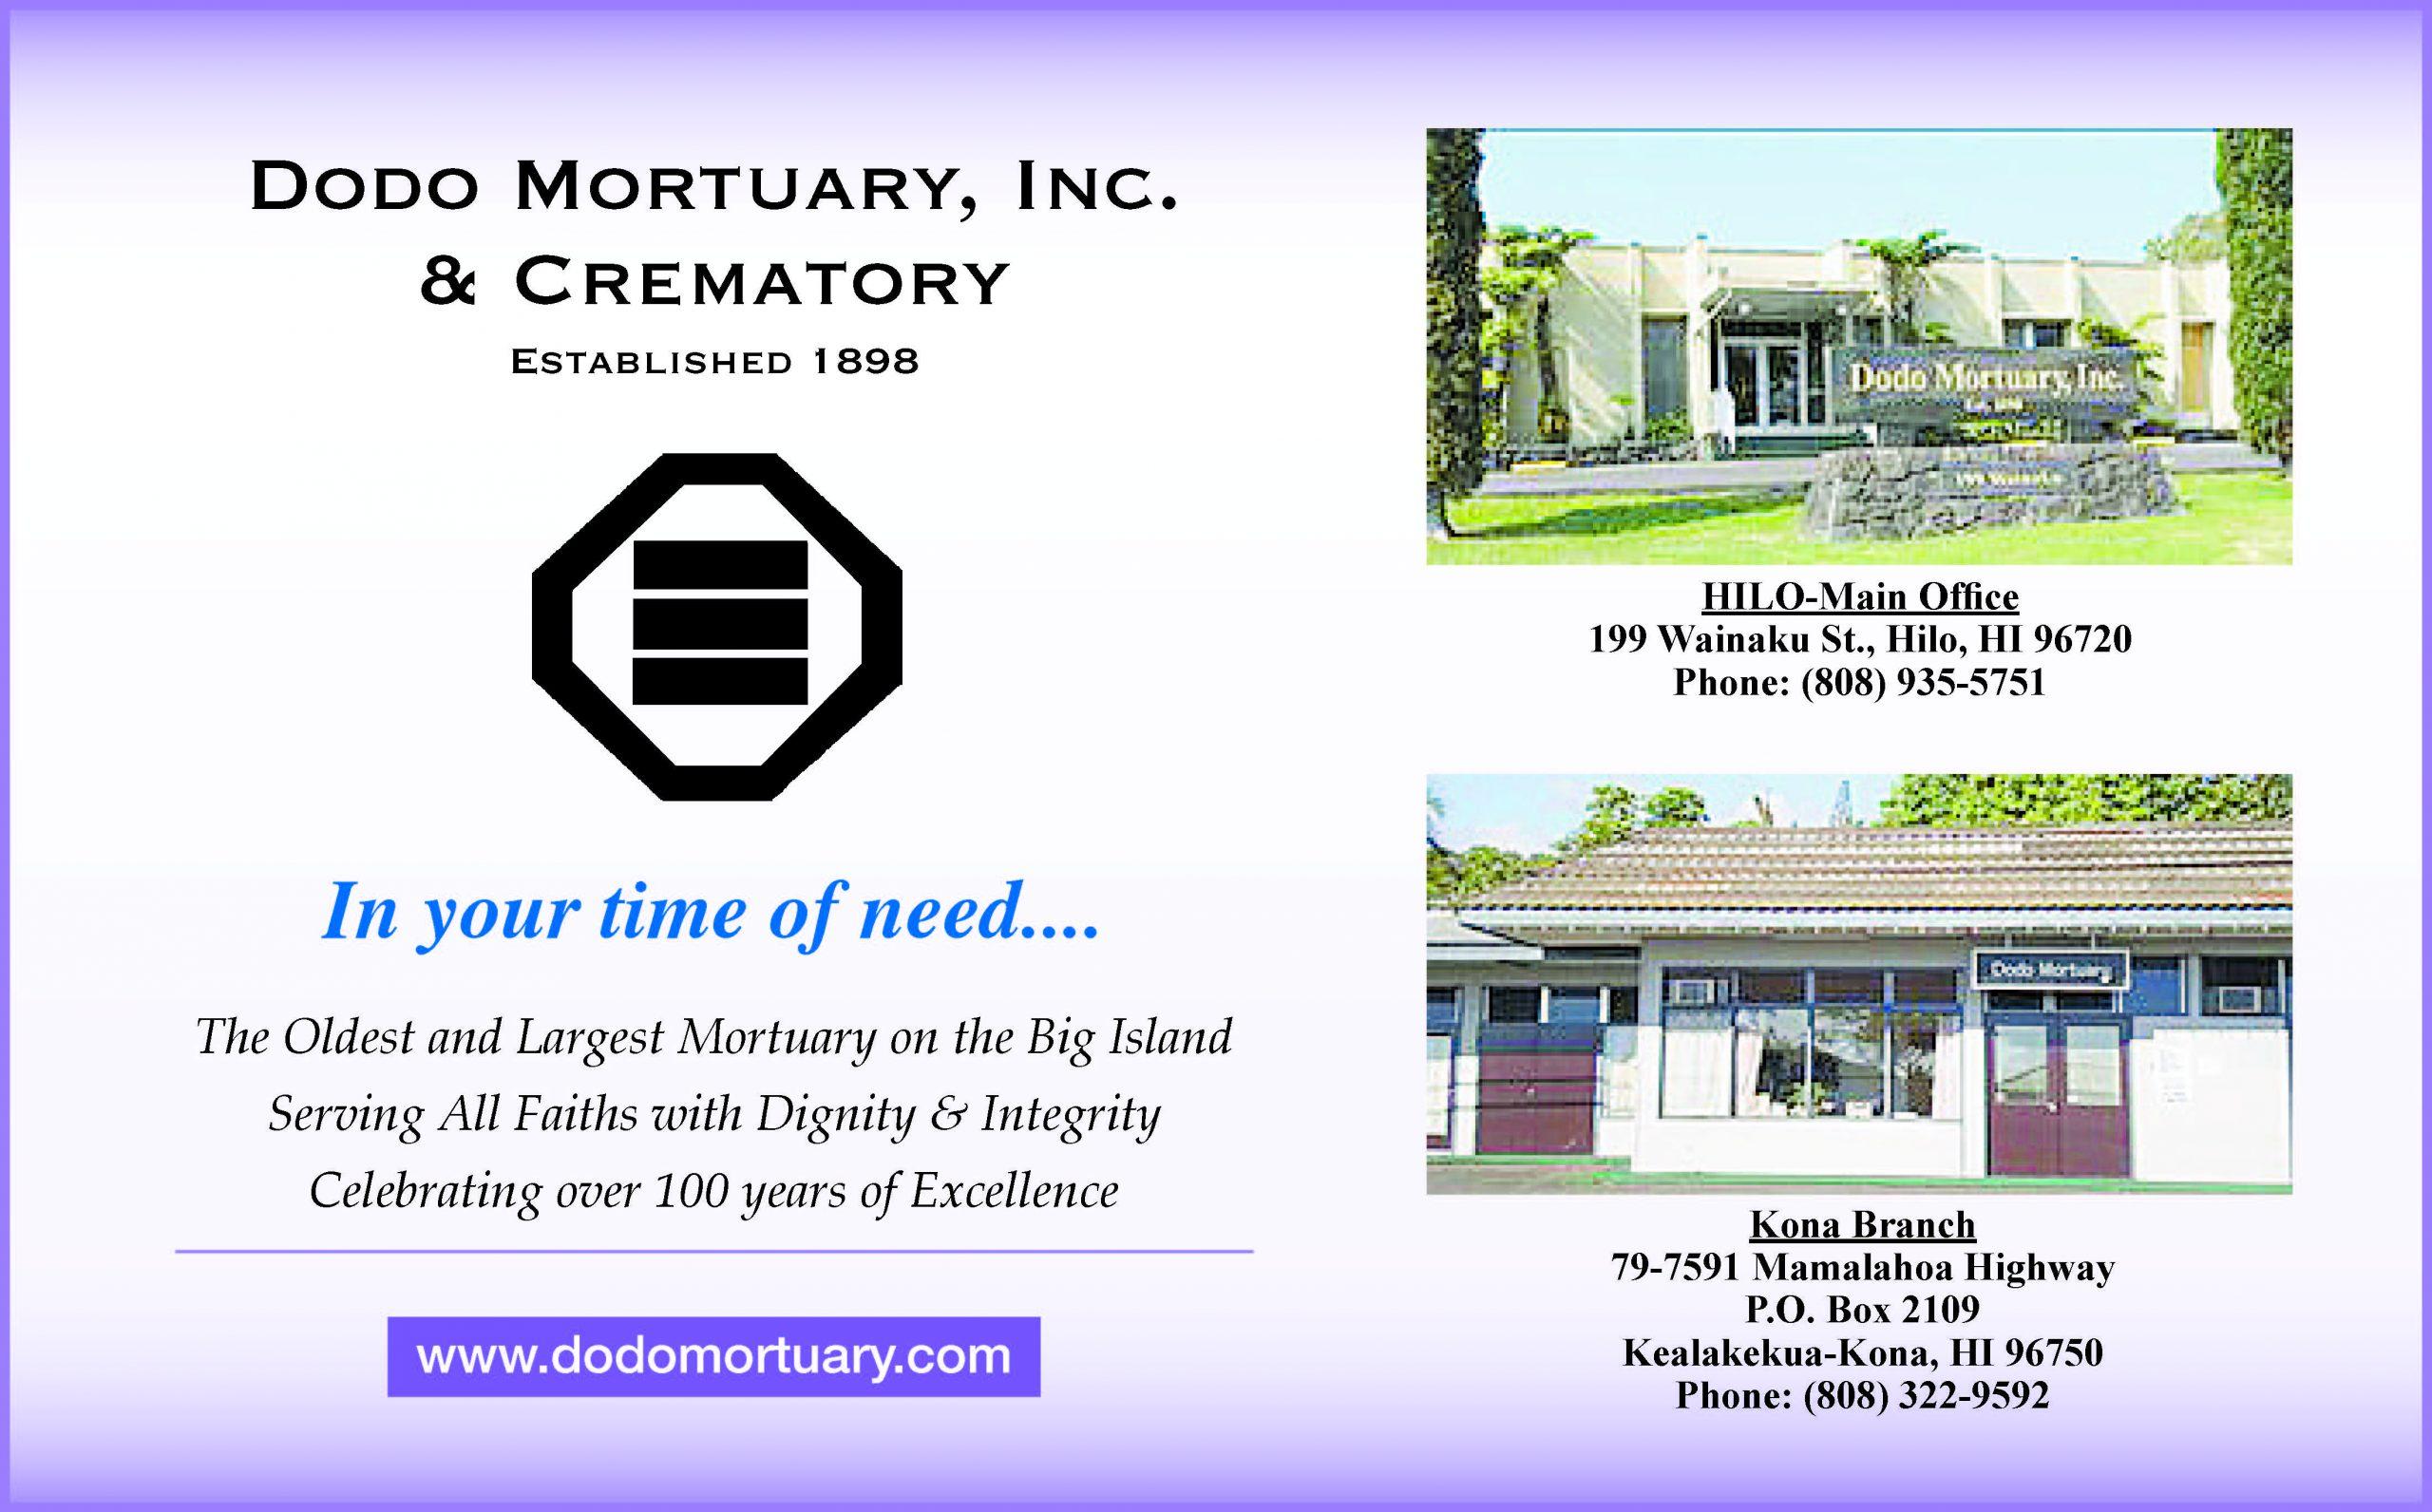 Dodo Mortuary Ad